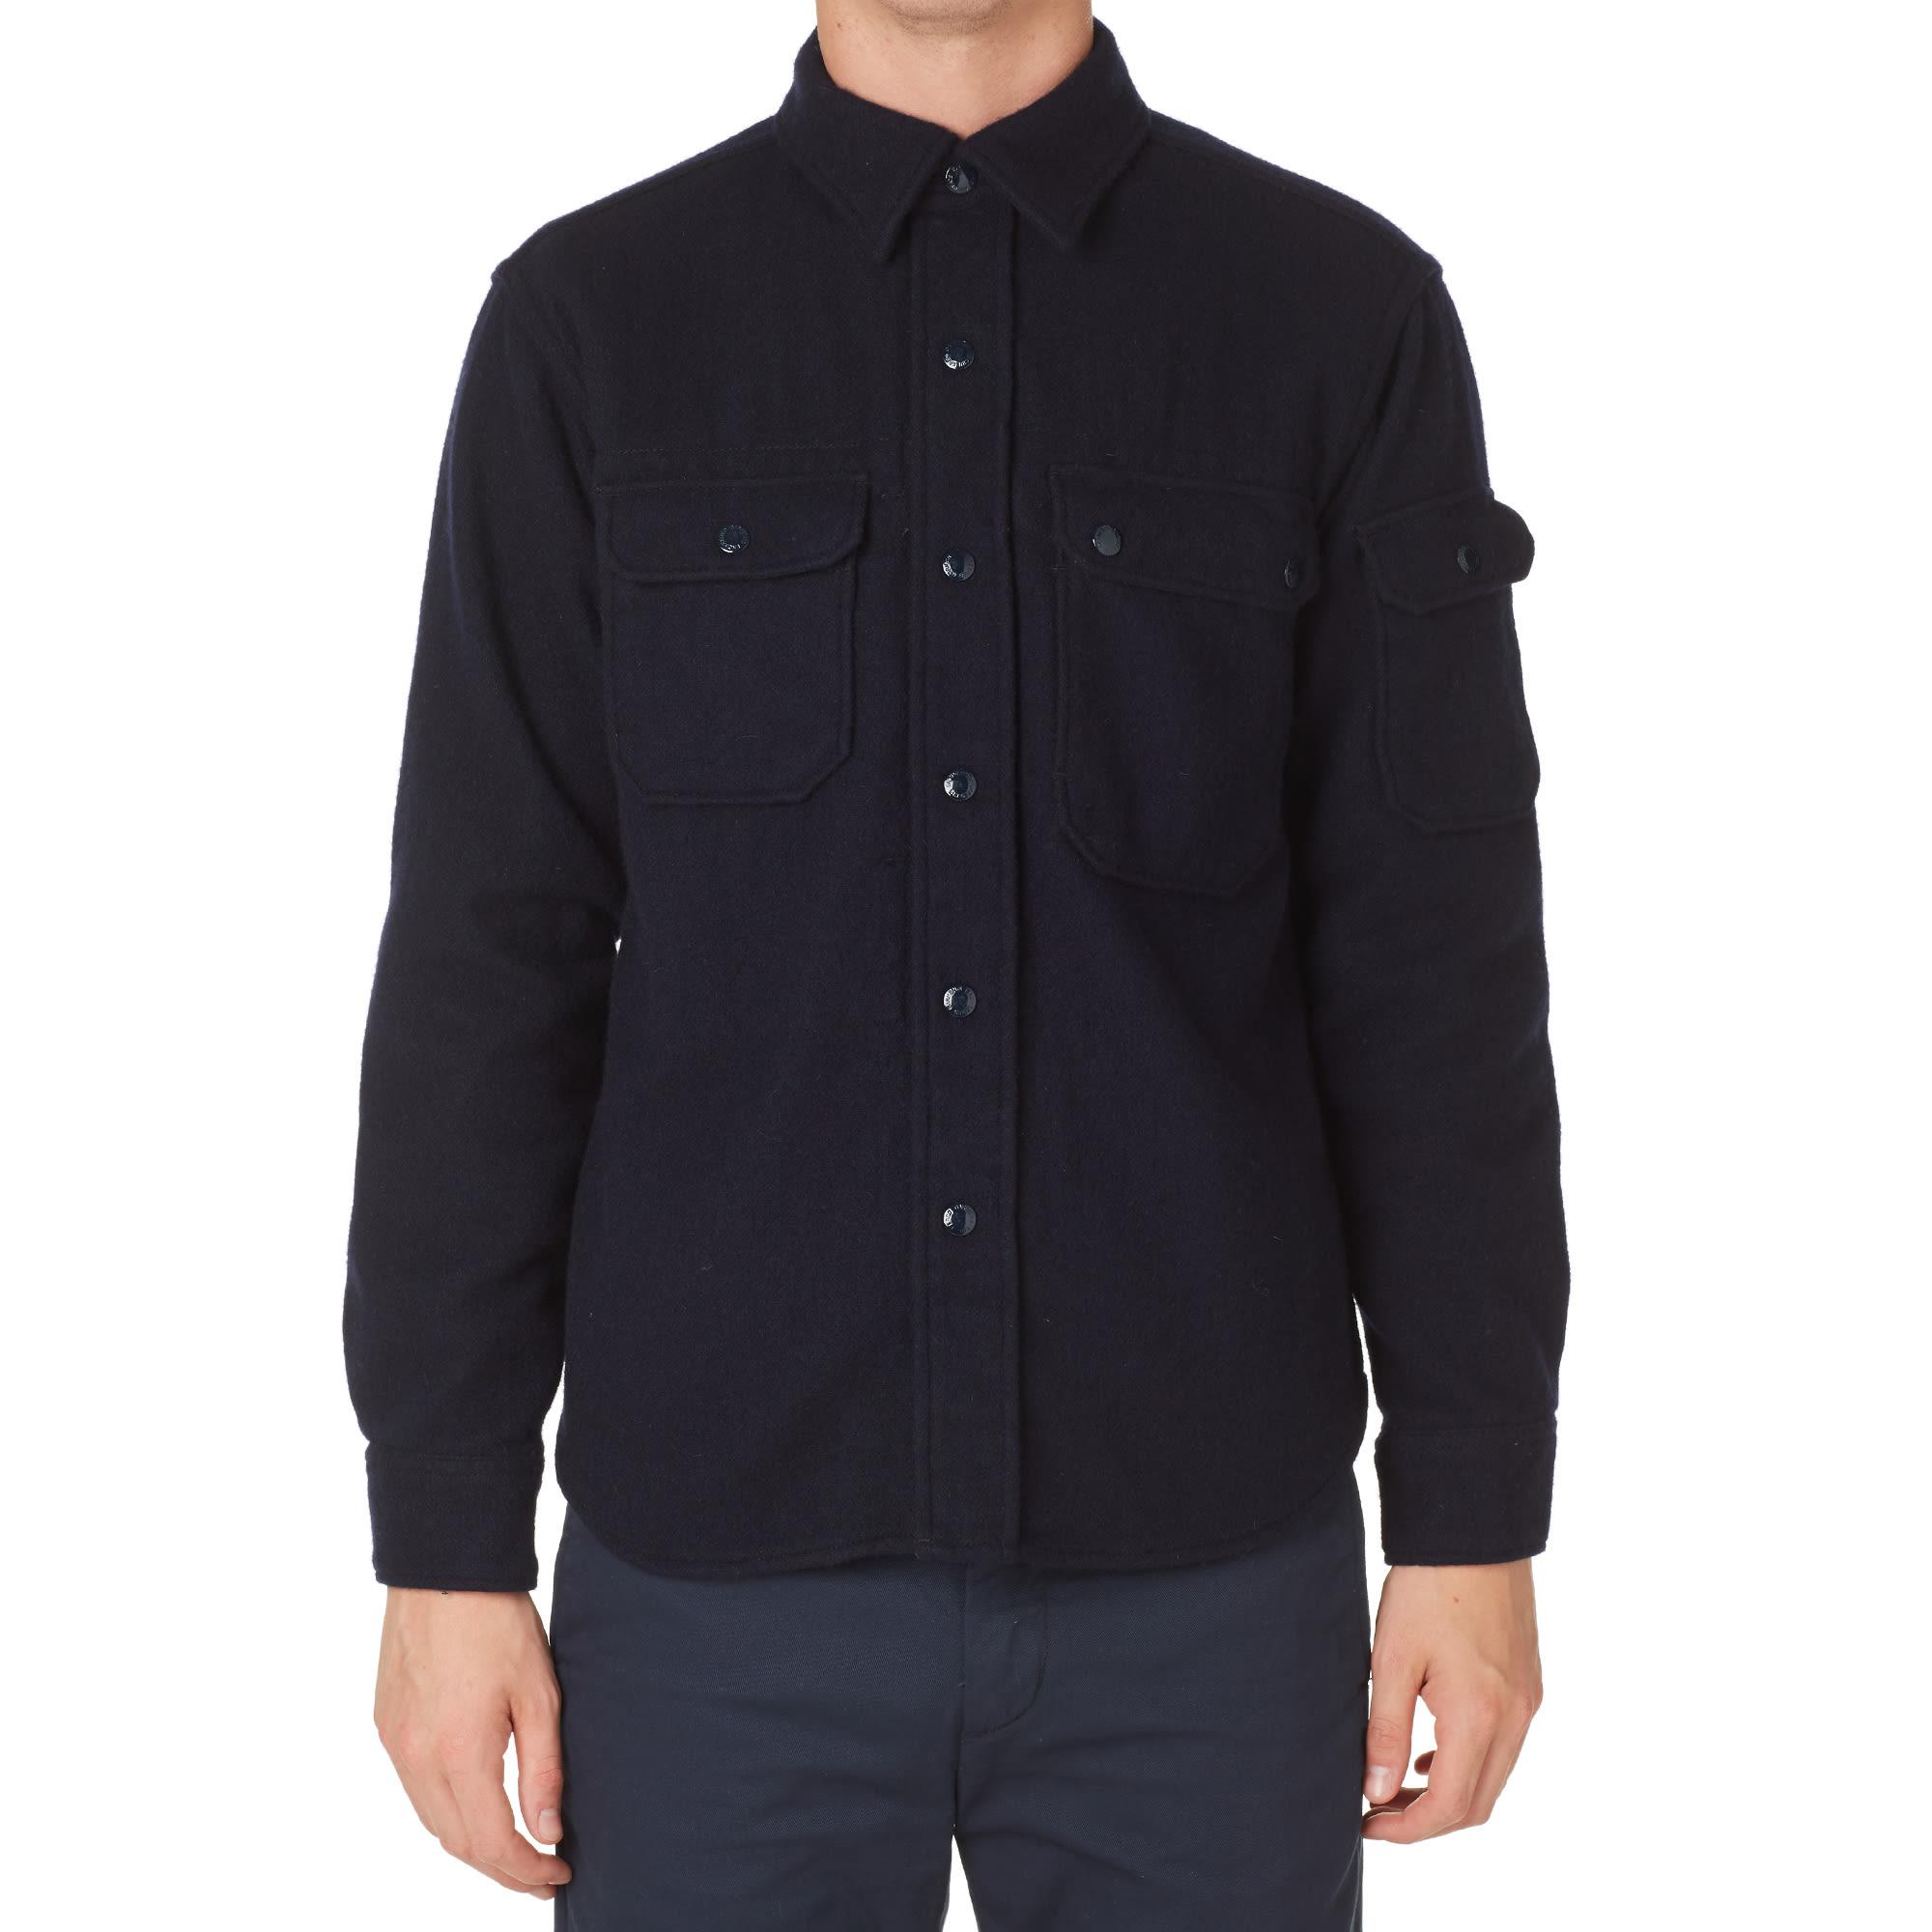 Engineered garments cpo shirt dark navy 16oz wool flannel for 9 oz flannel shirt